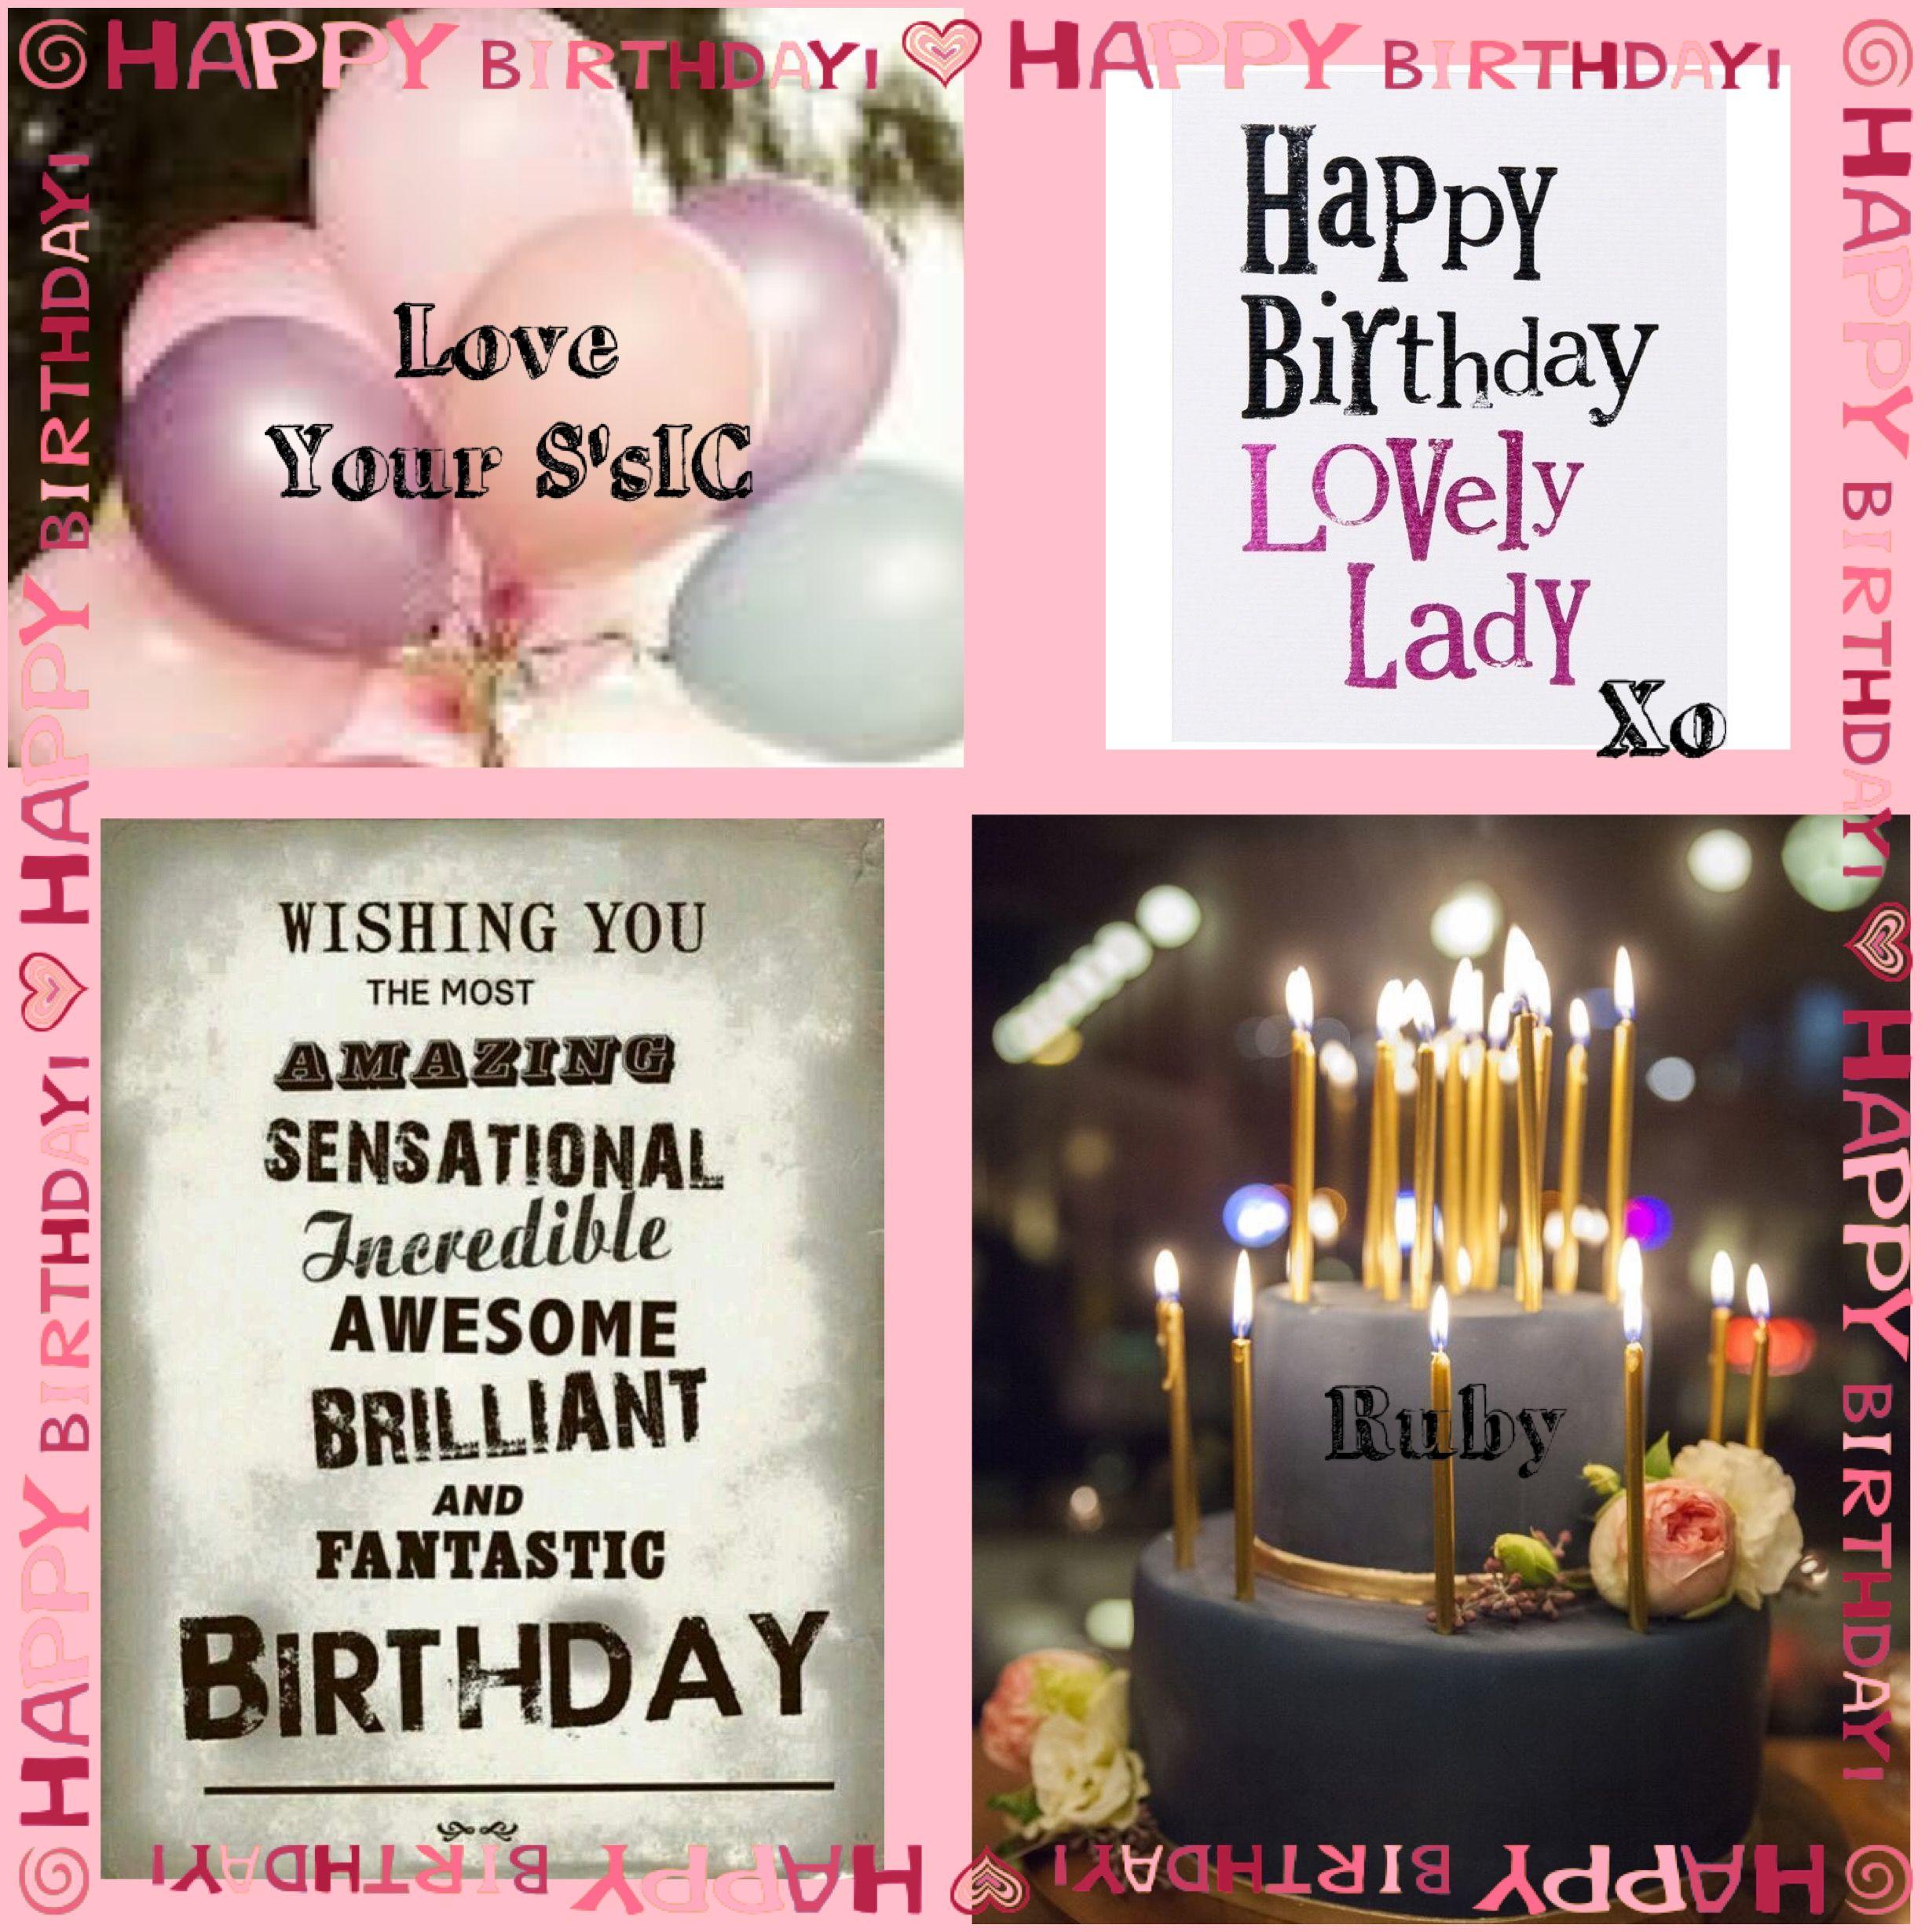 Happy Happy Birthday Sweet Ruby Love And Birthday Hugs